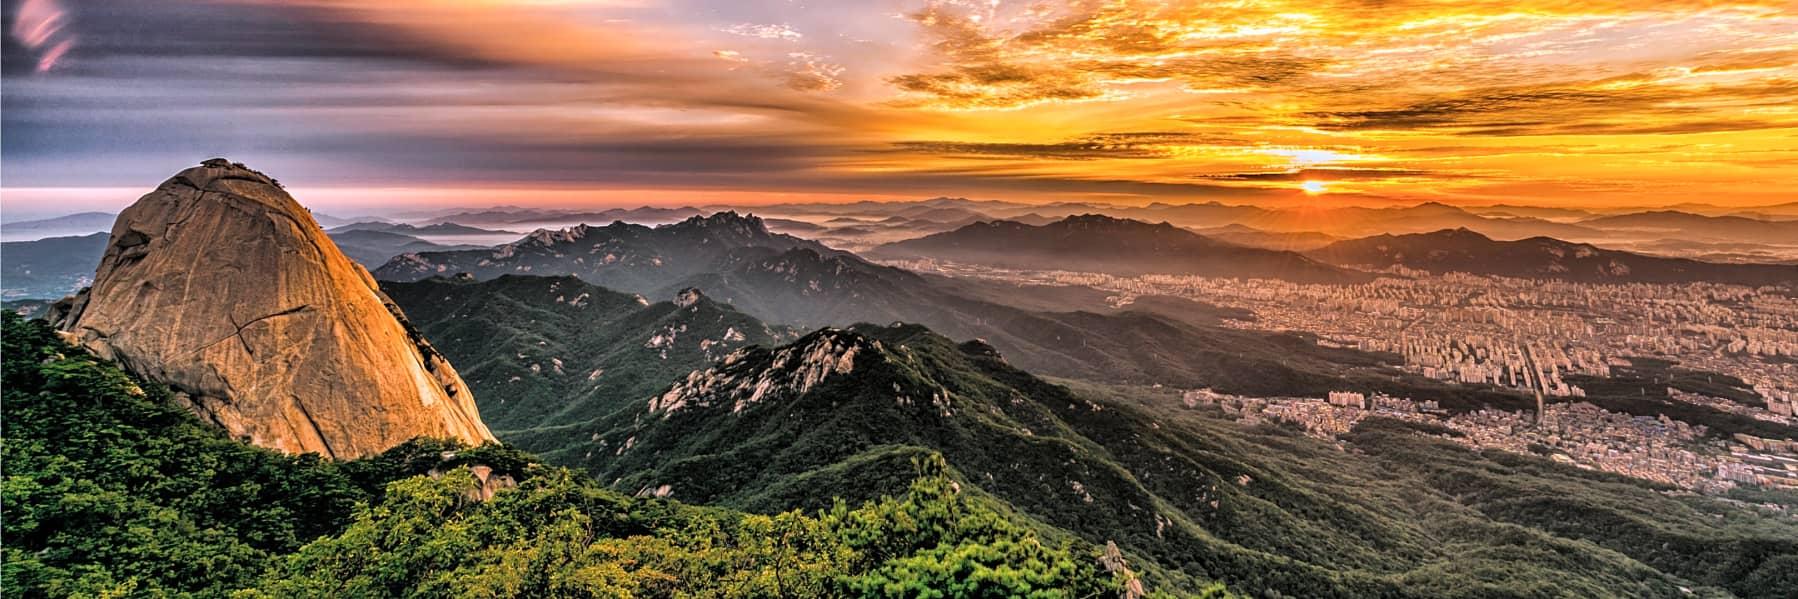 Bukhansan National Park Tour & Korean Spa Experience – Full Day gallery